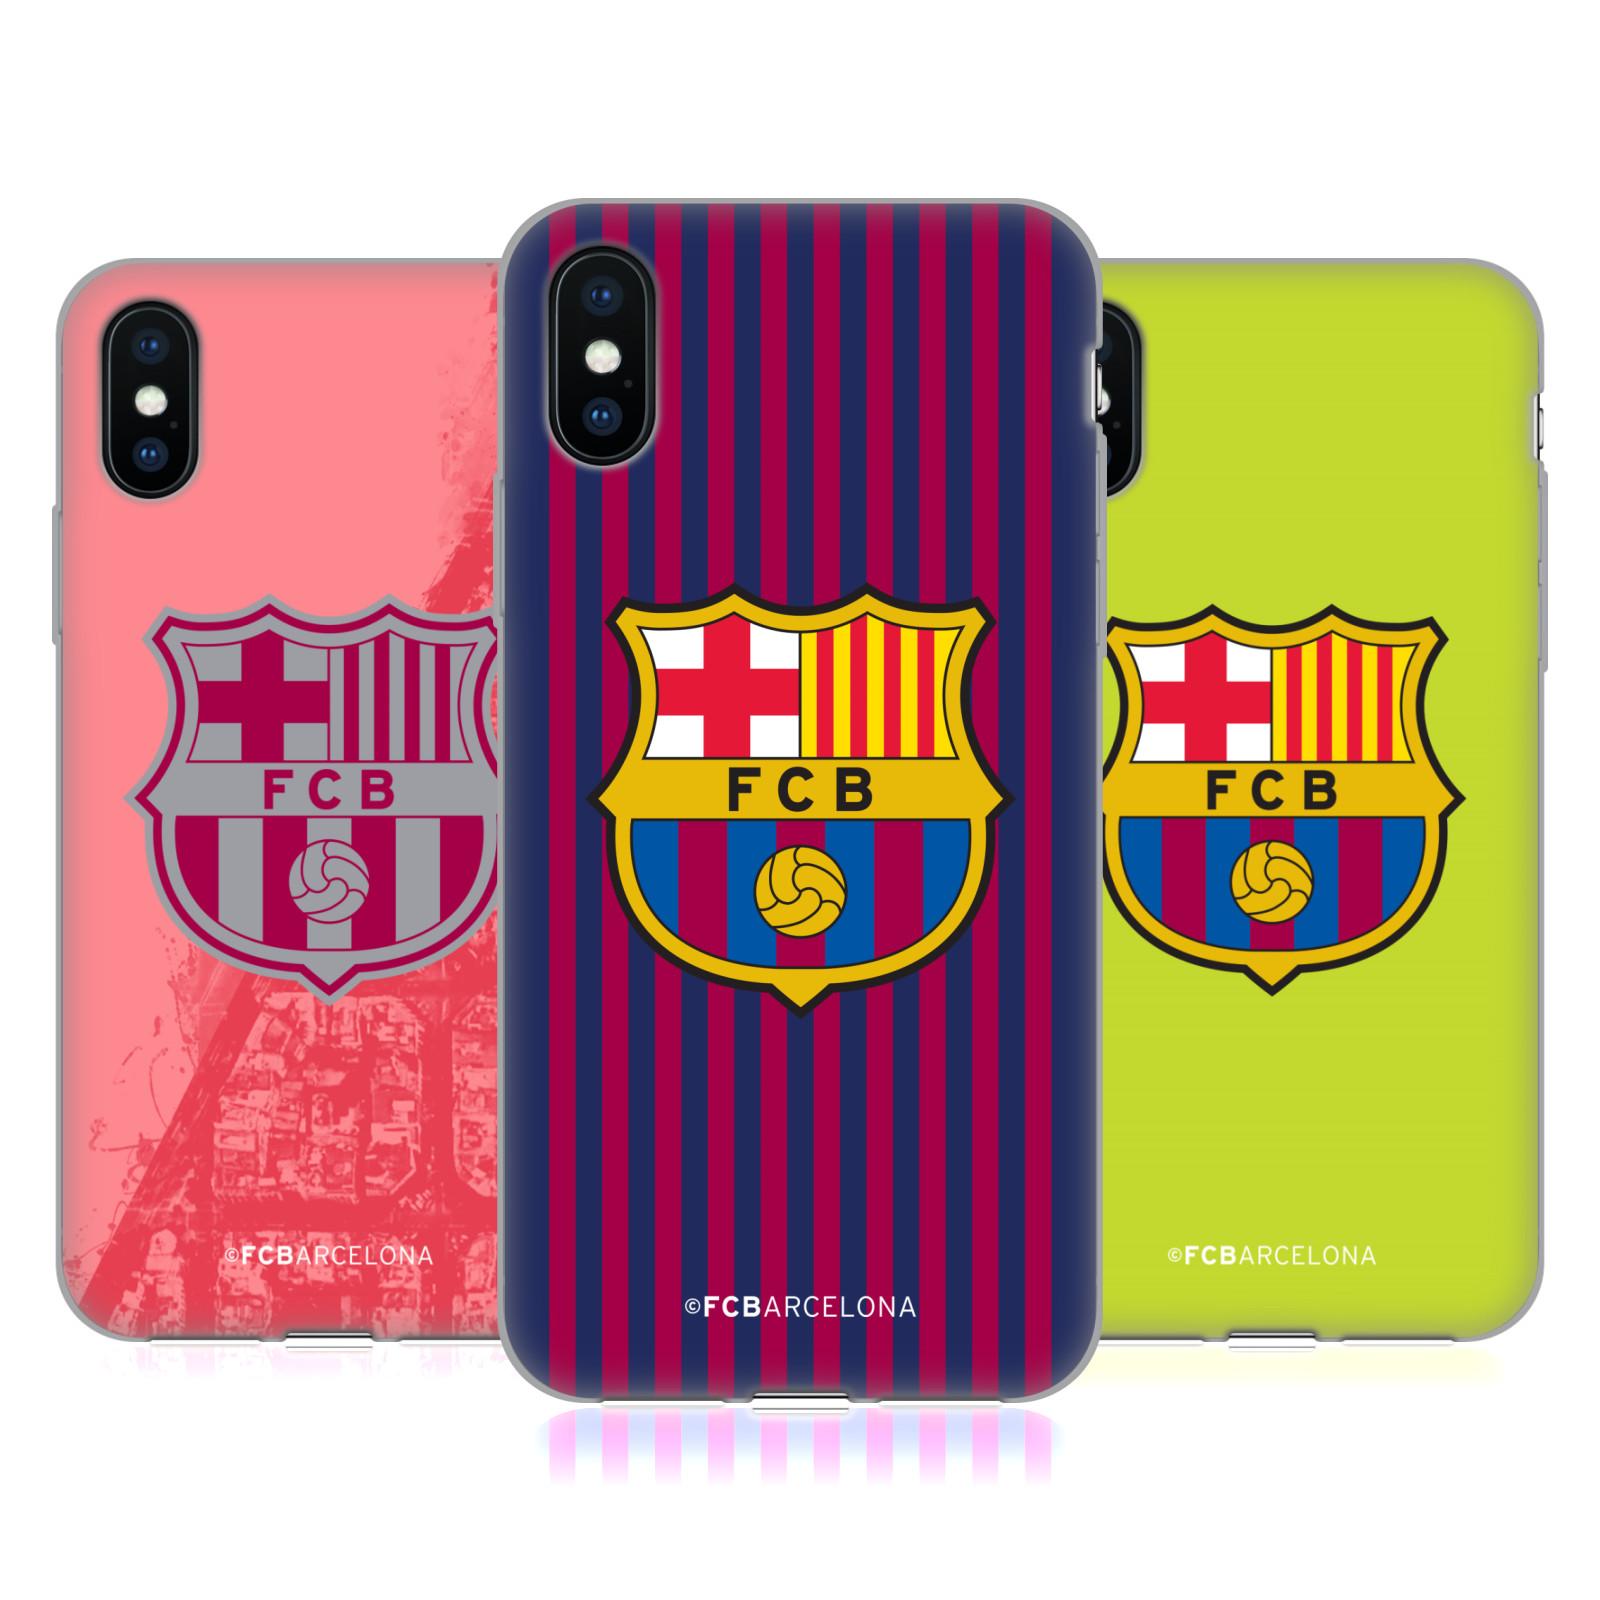 FC Barcelona 2018/19 Crest Kit